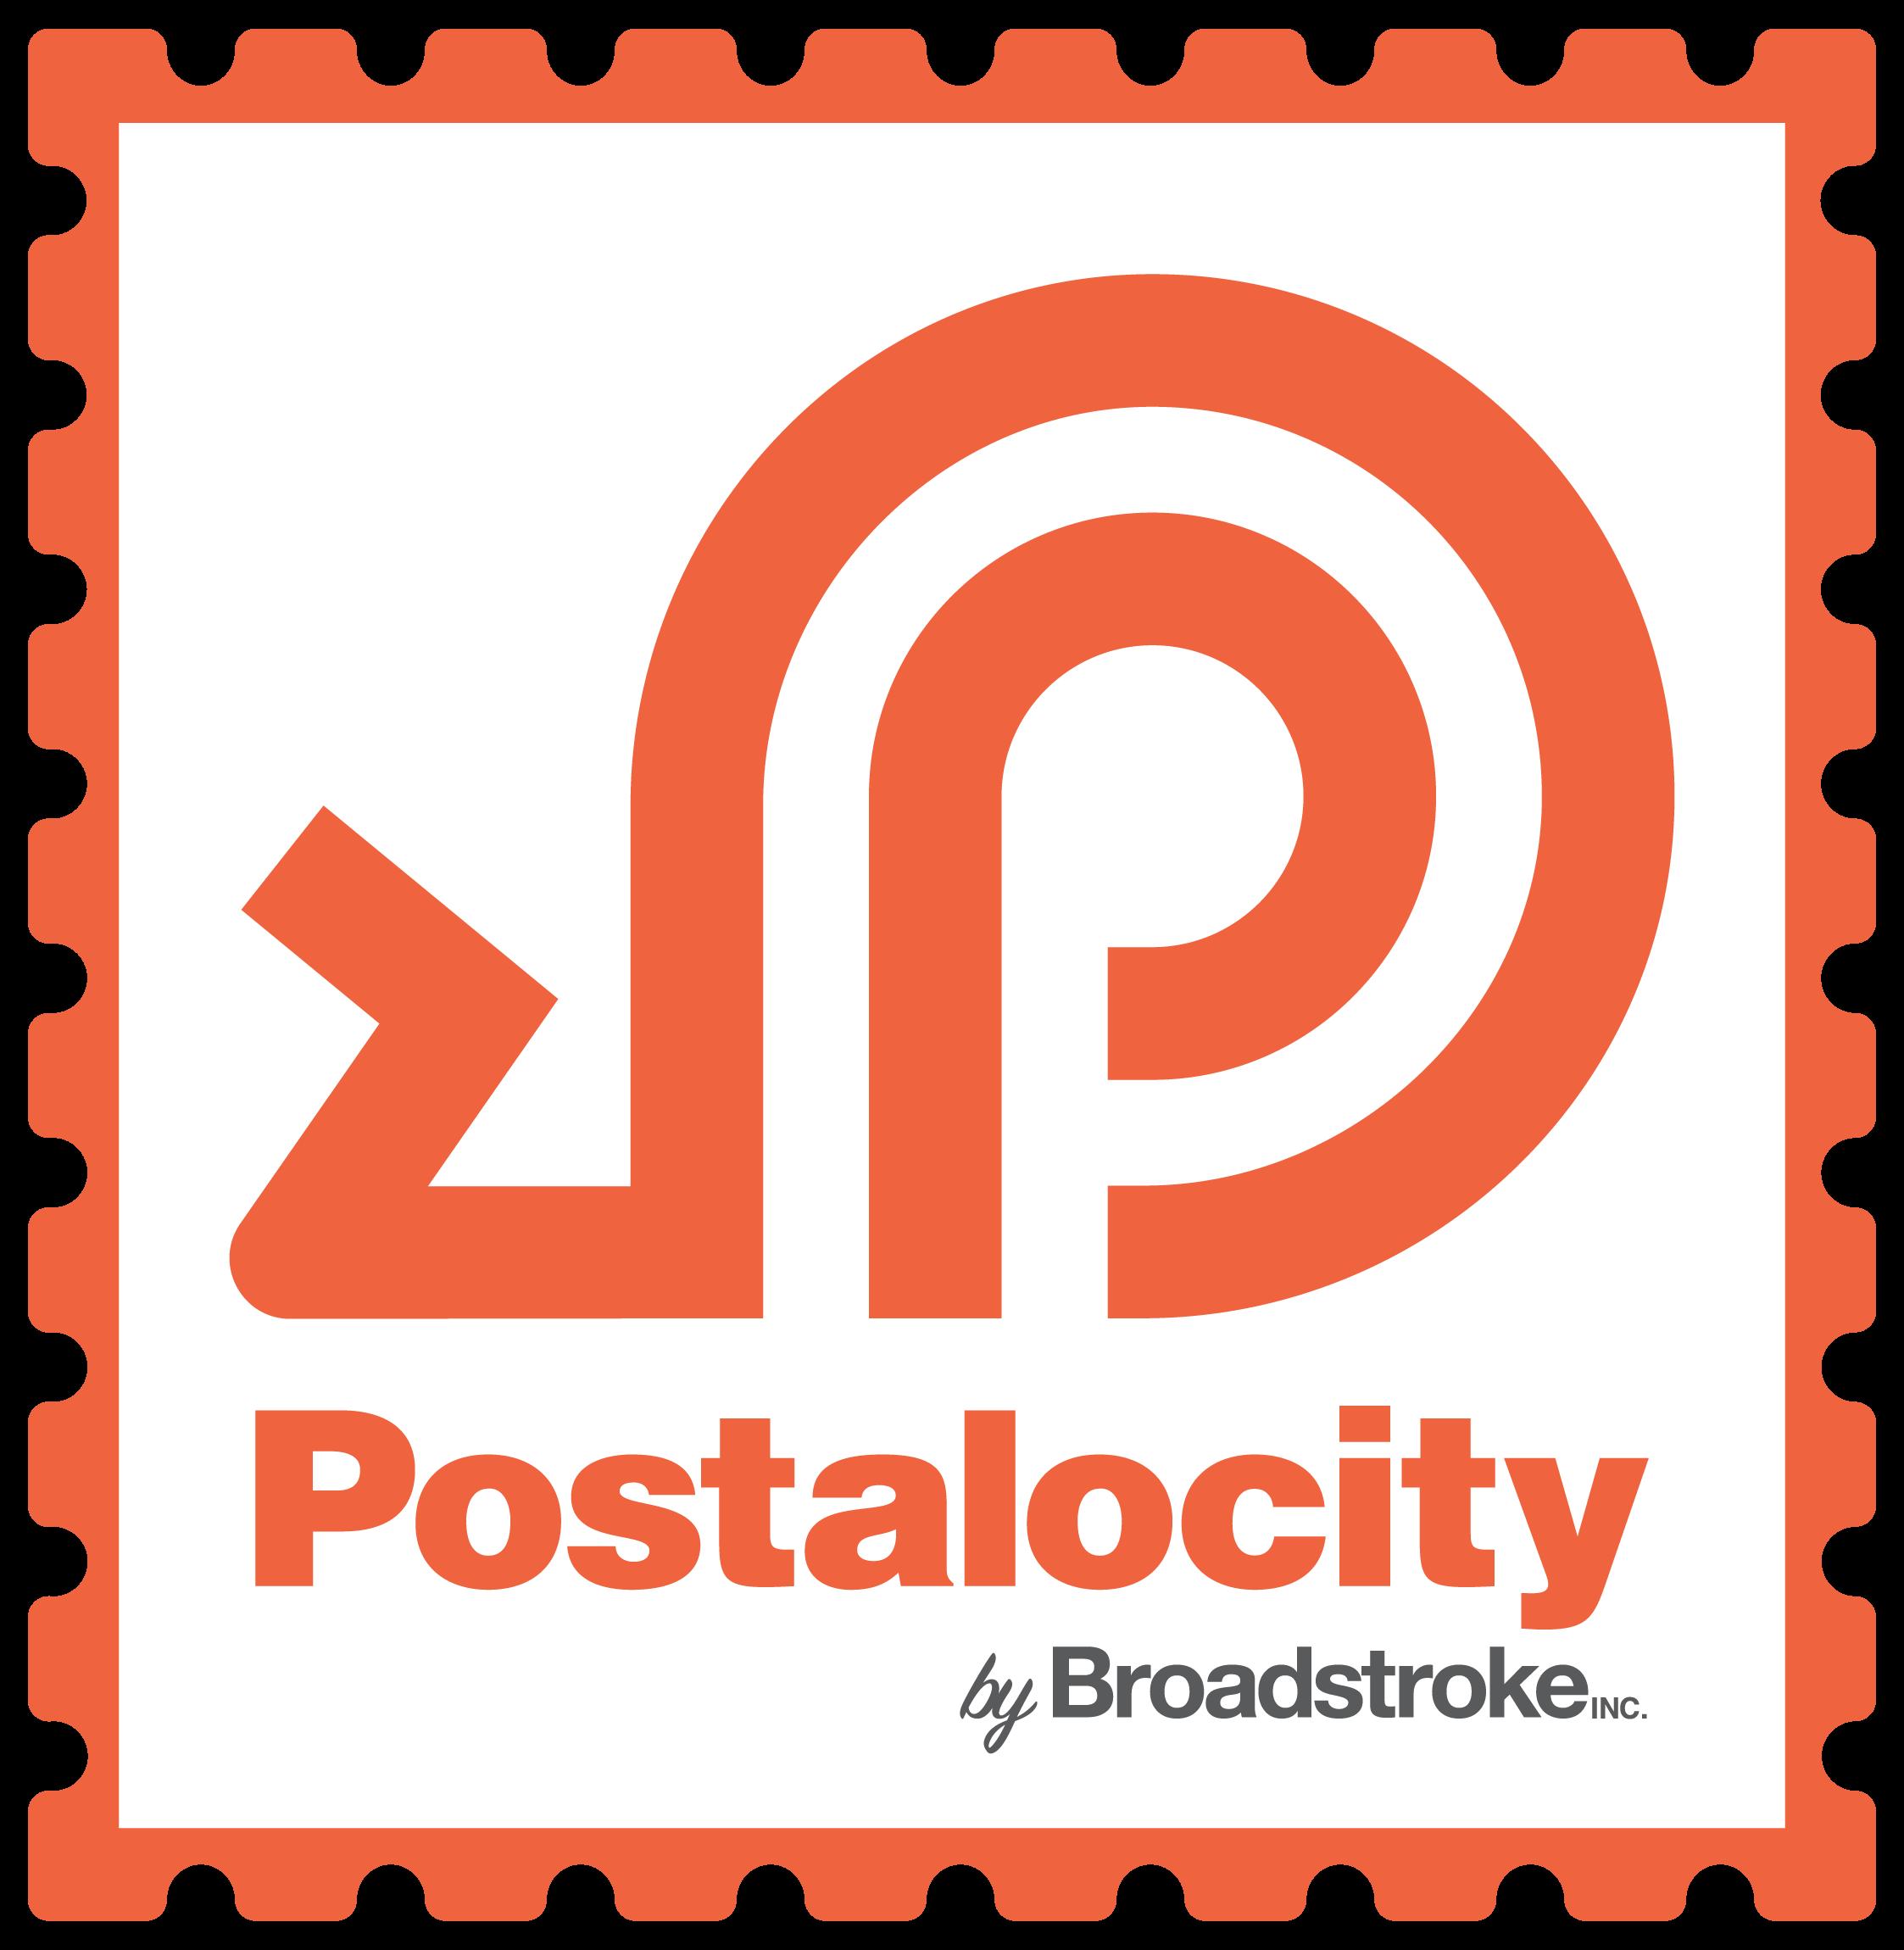 Postalocity Stamp